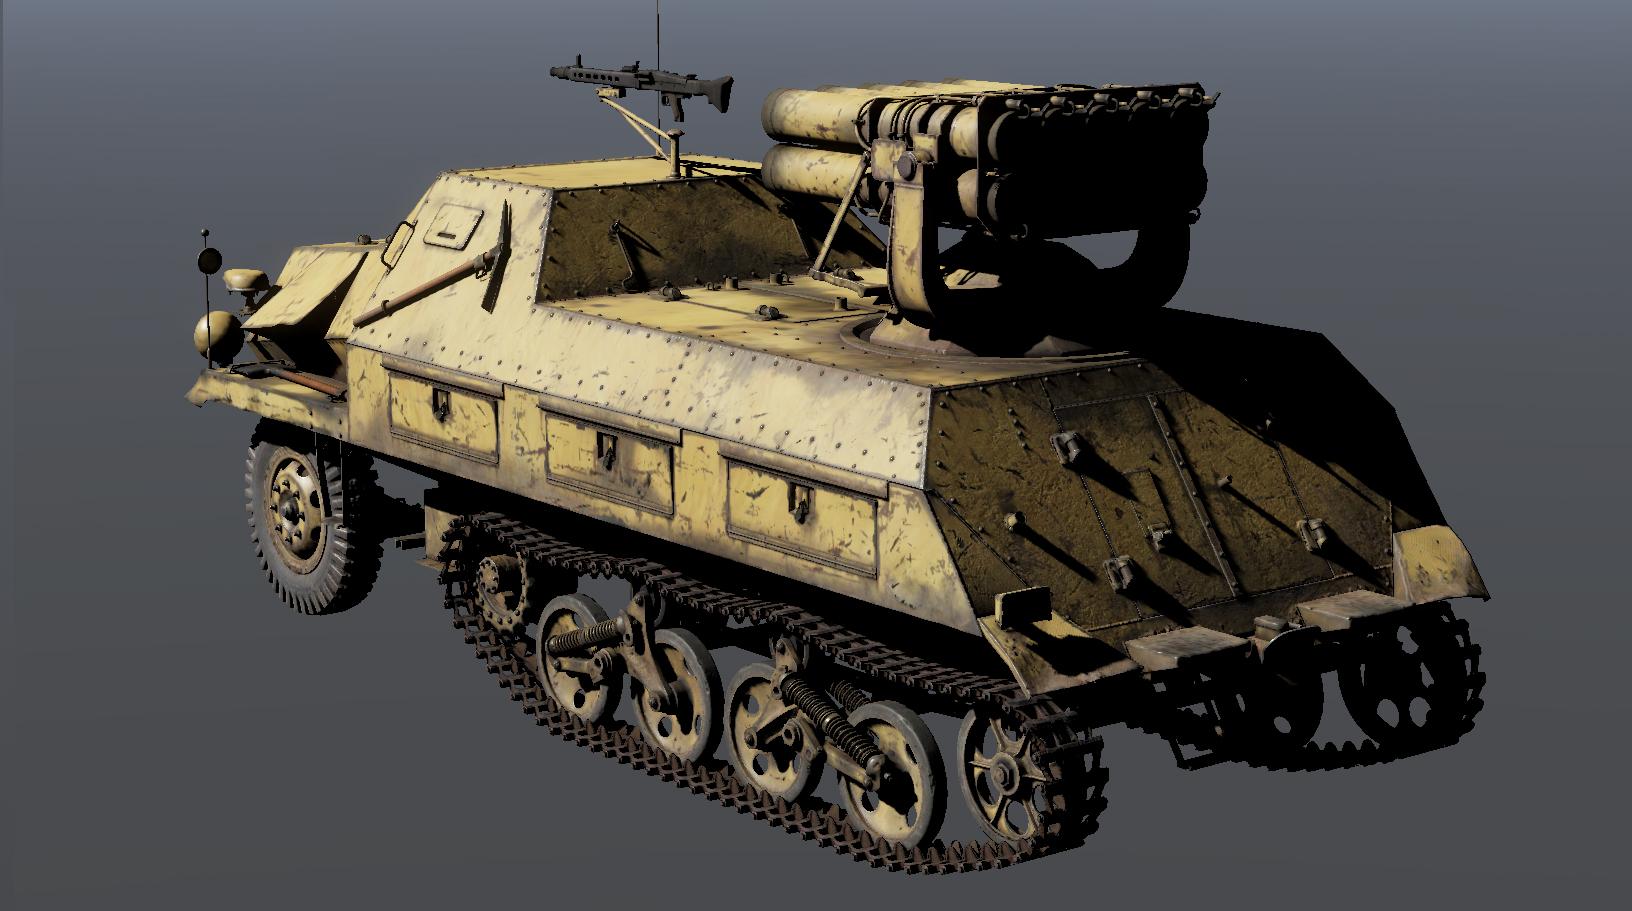 War Thunder - T25 Medium Tank and Panzerwerfer 42 Auf.Sf - The Armored Patrol